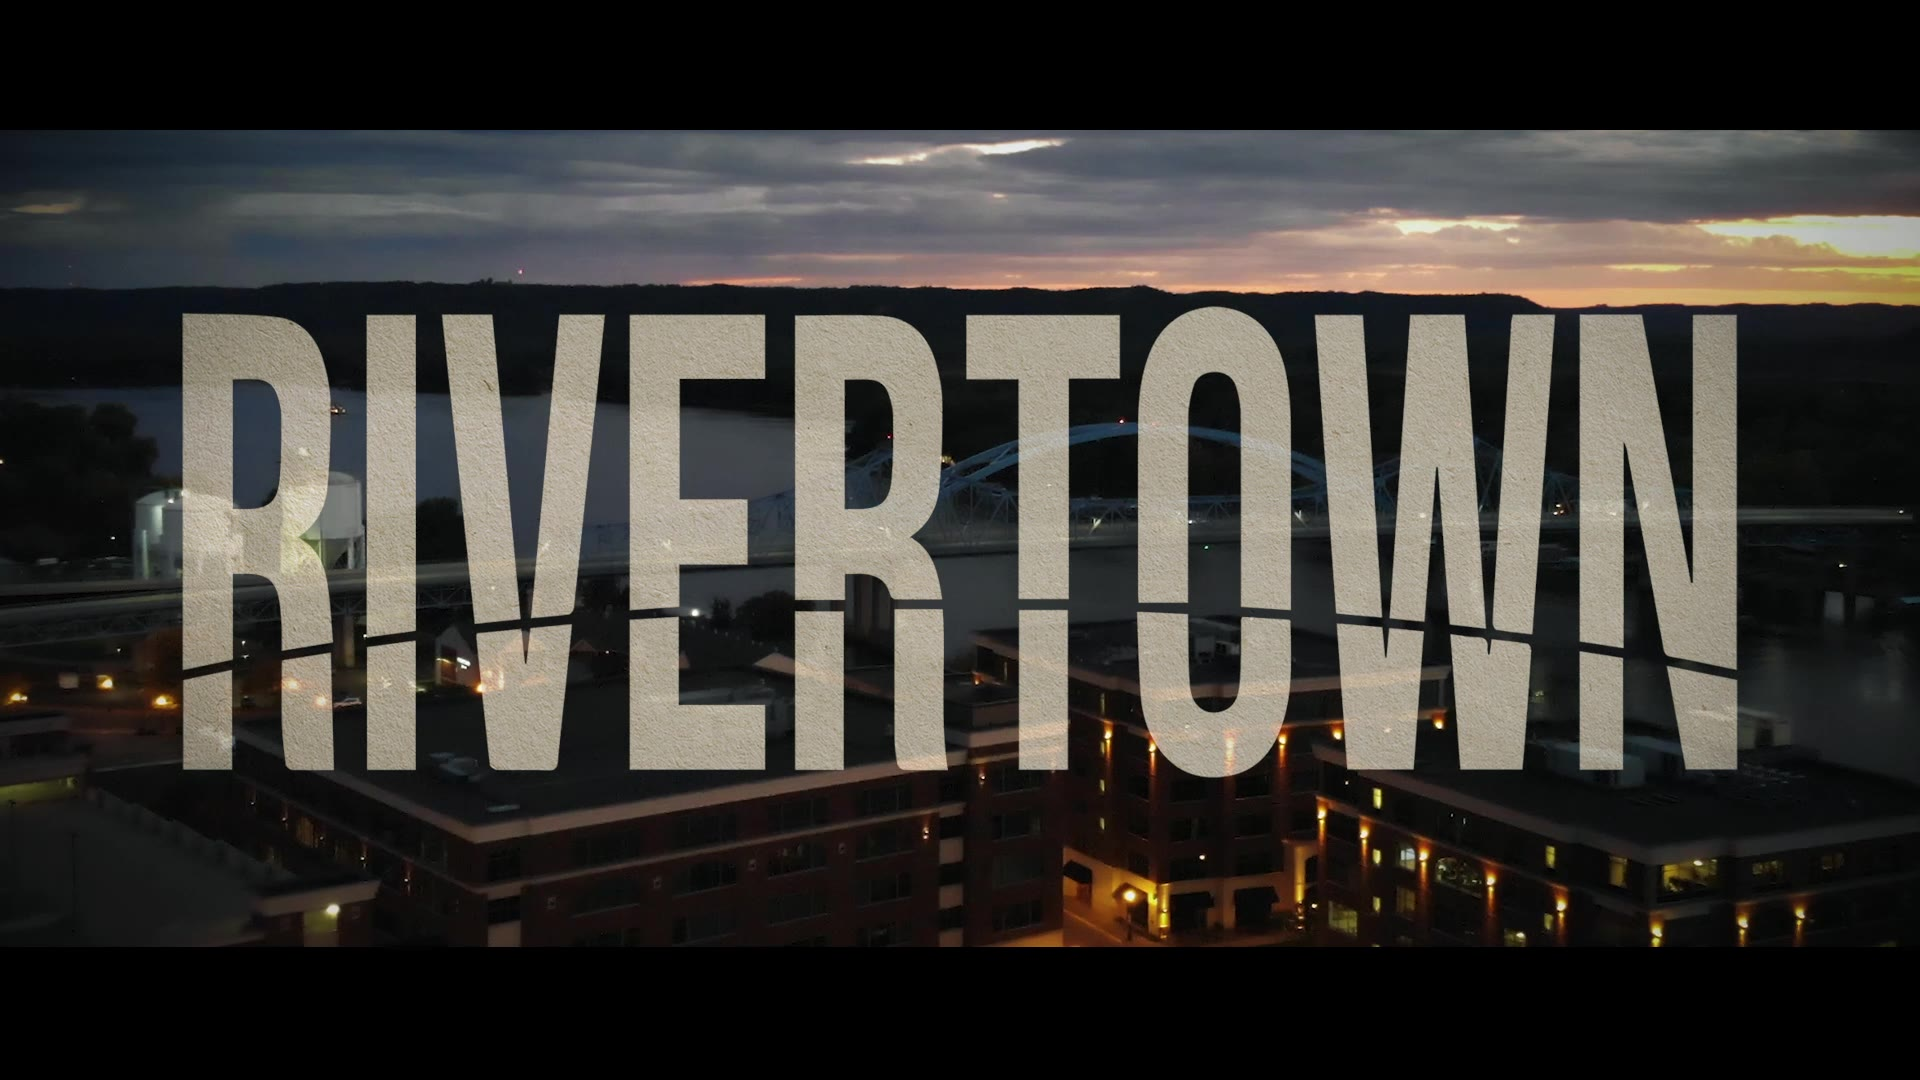 Rivertown La Crosse Web Extra: Suicide in the Media